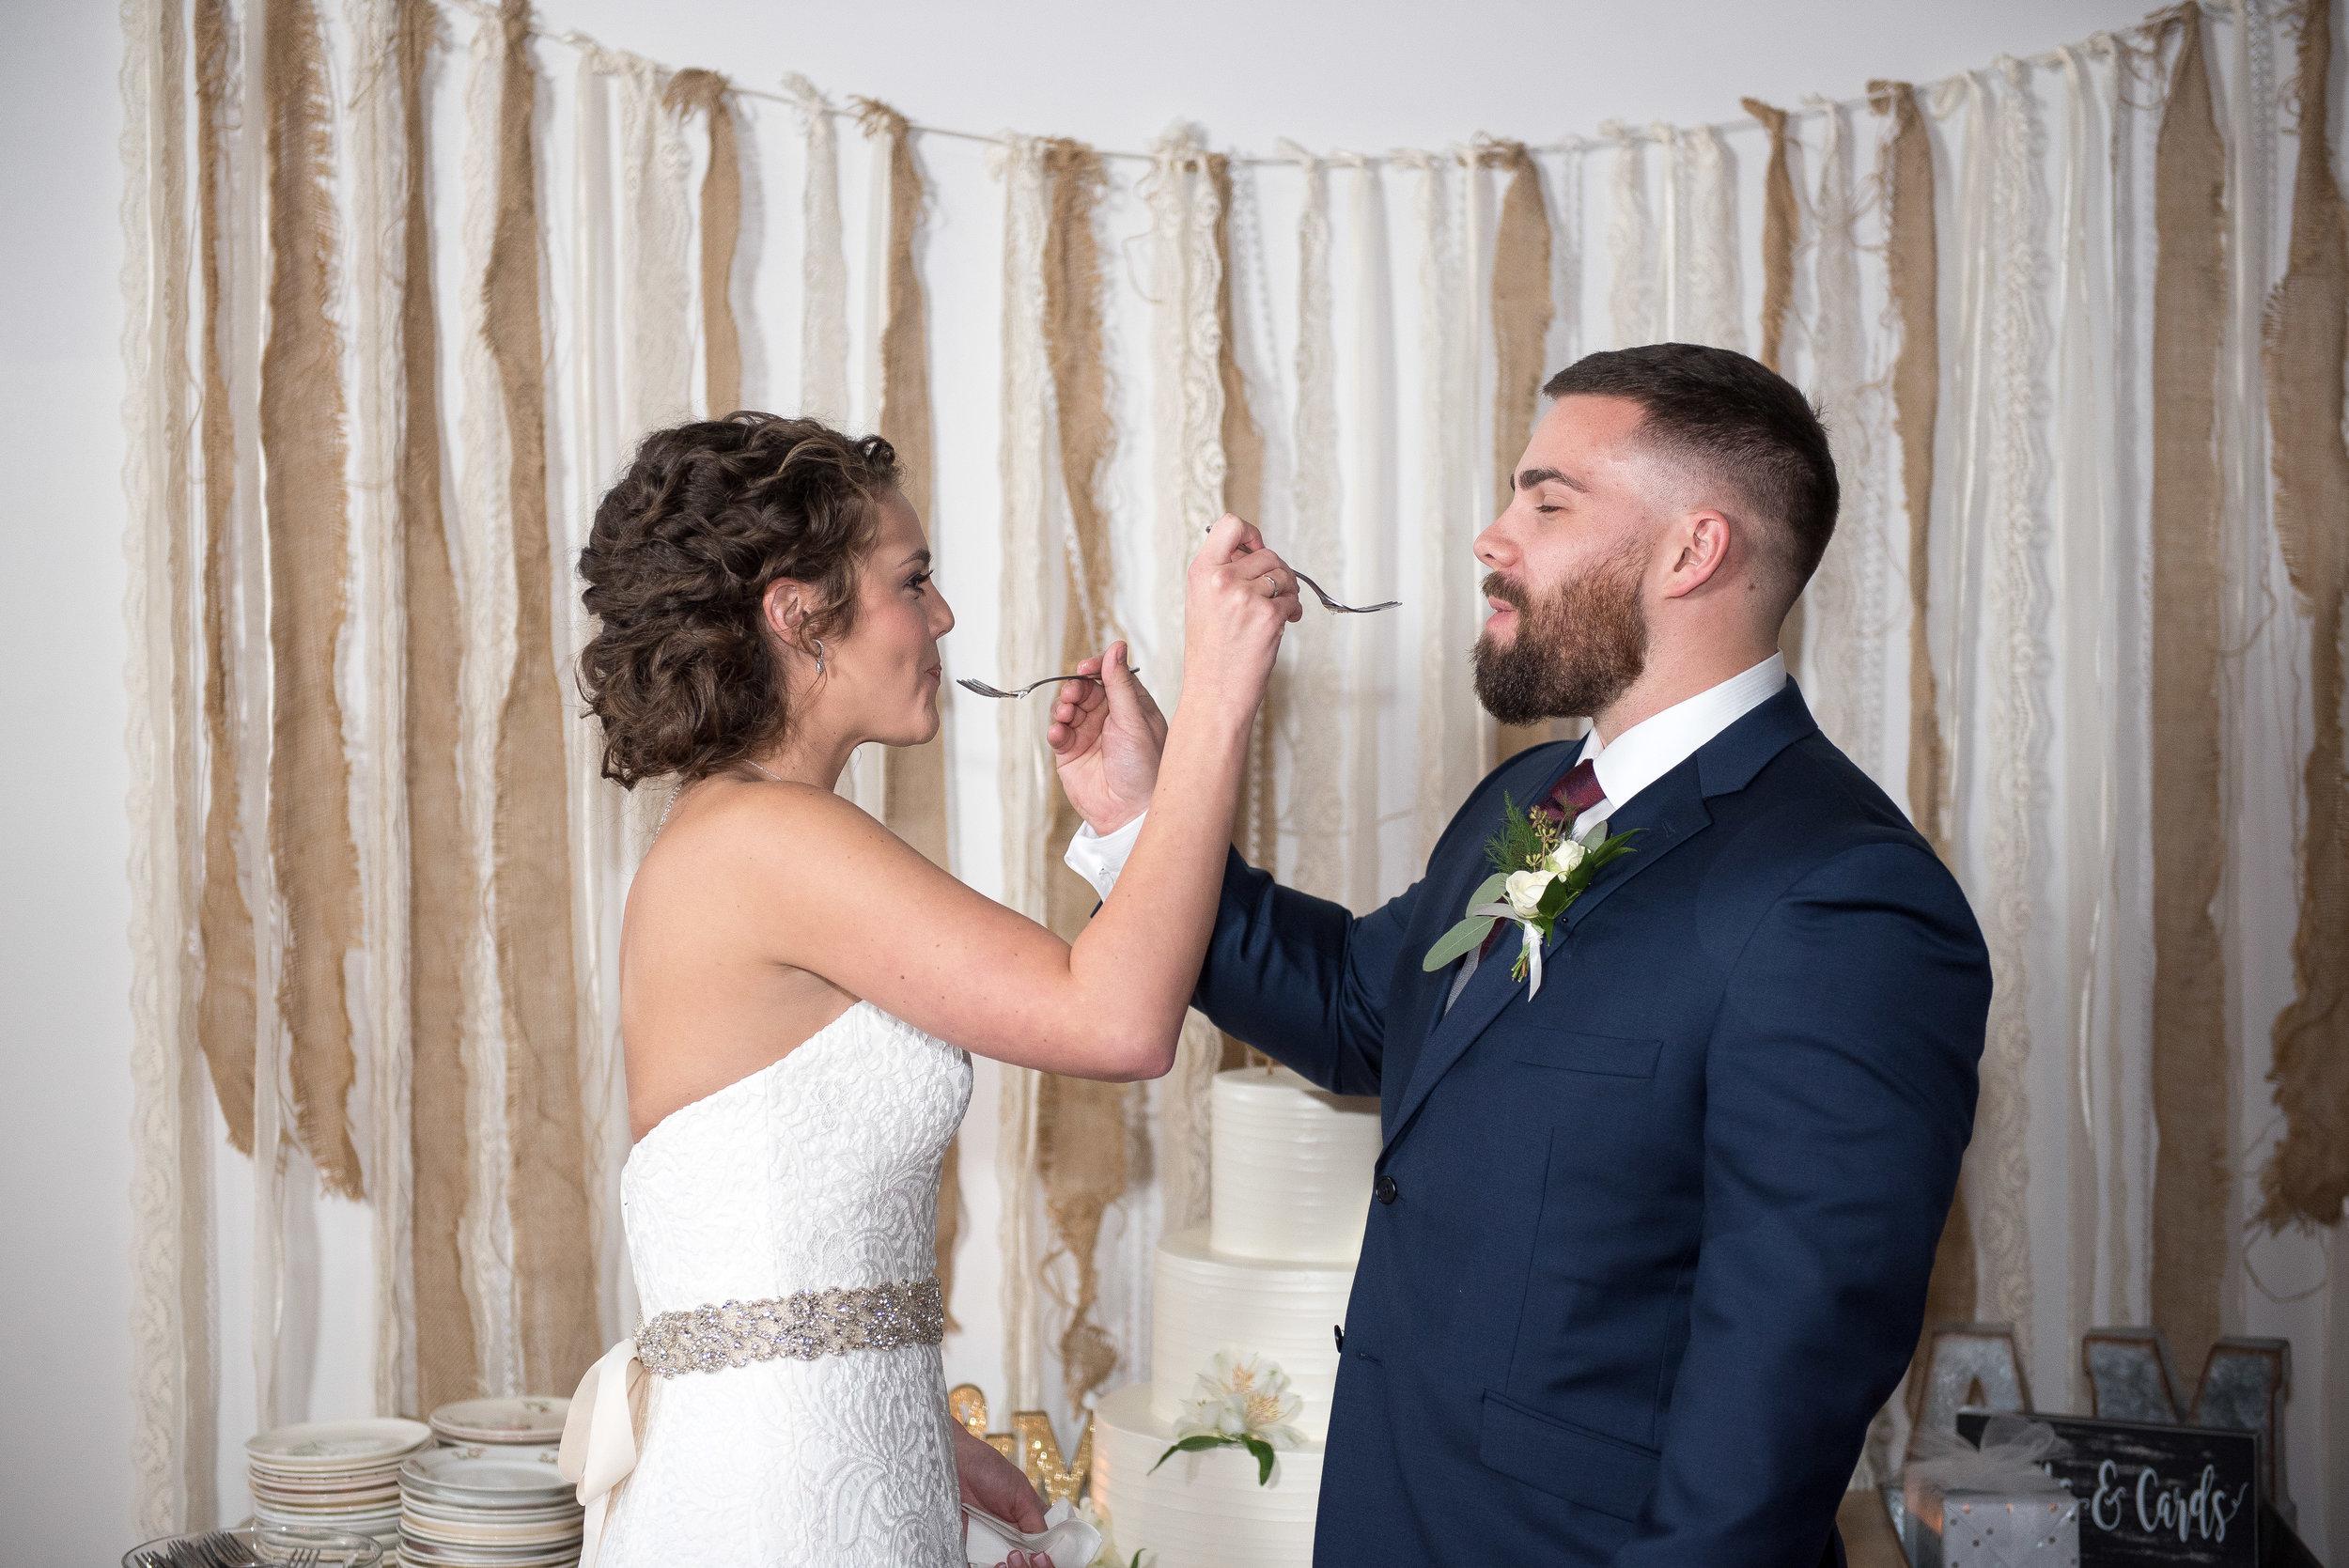 The Roller Mill Events - Winston Salem Weddings - NC Weddings - High Point NC Weddings - Winston Salem Venue - Yasmin Leonard Photography-75.jpg